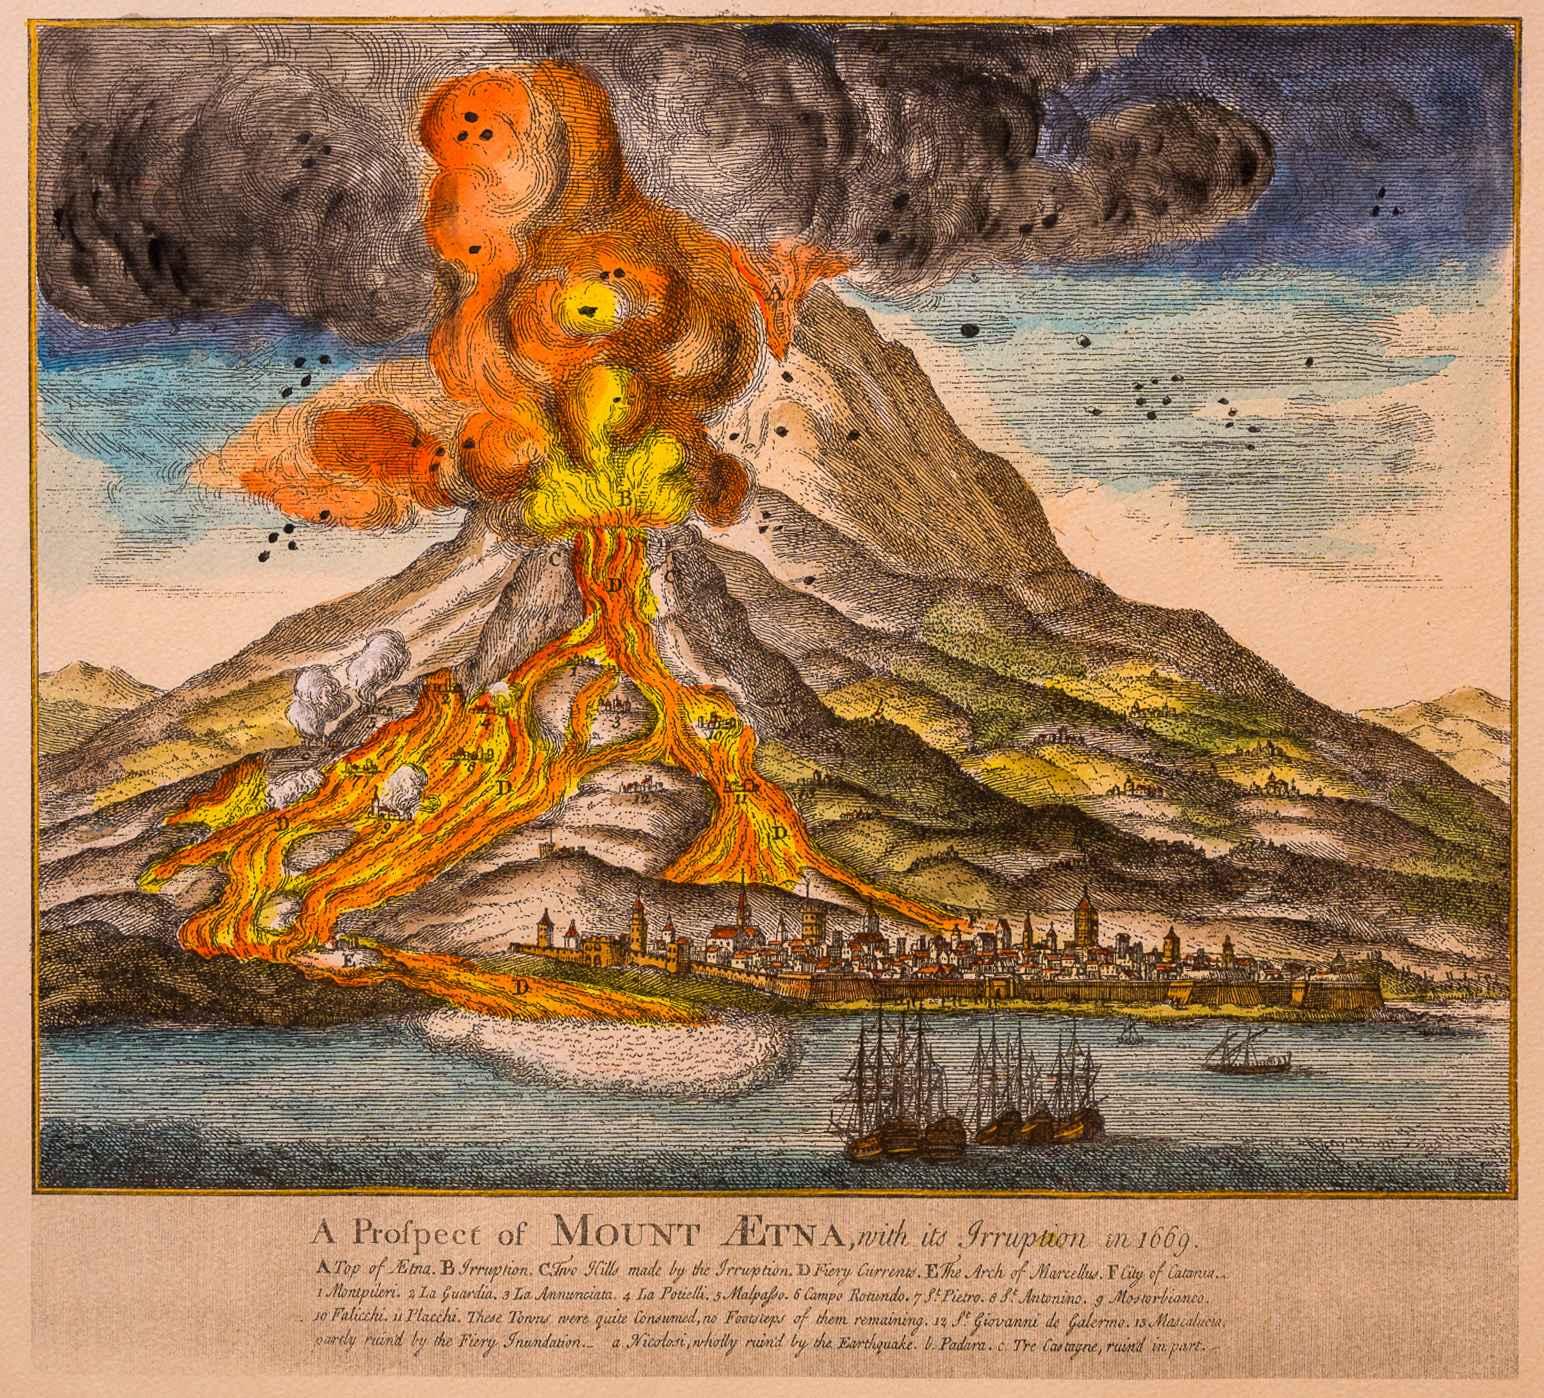 Etna su carta manoscritta - Riproduzione artigianale